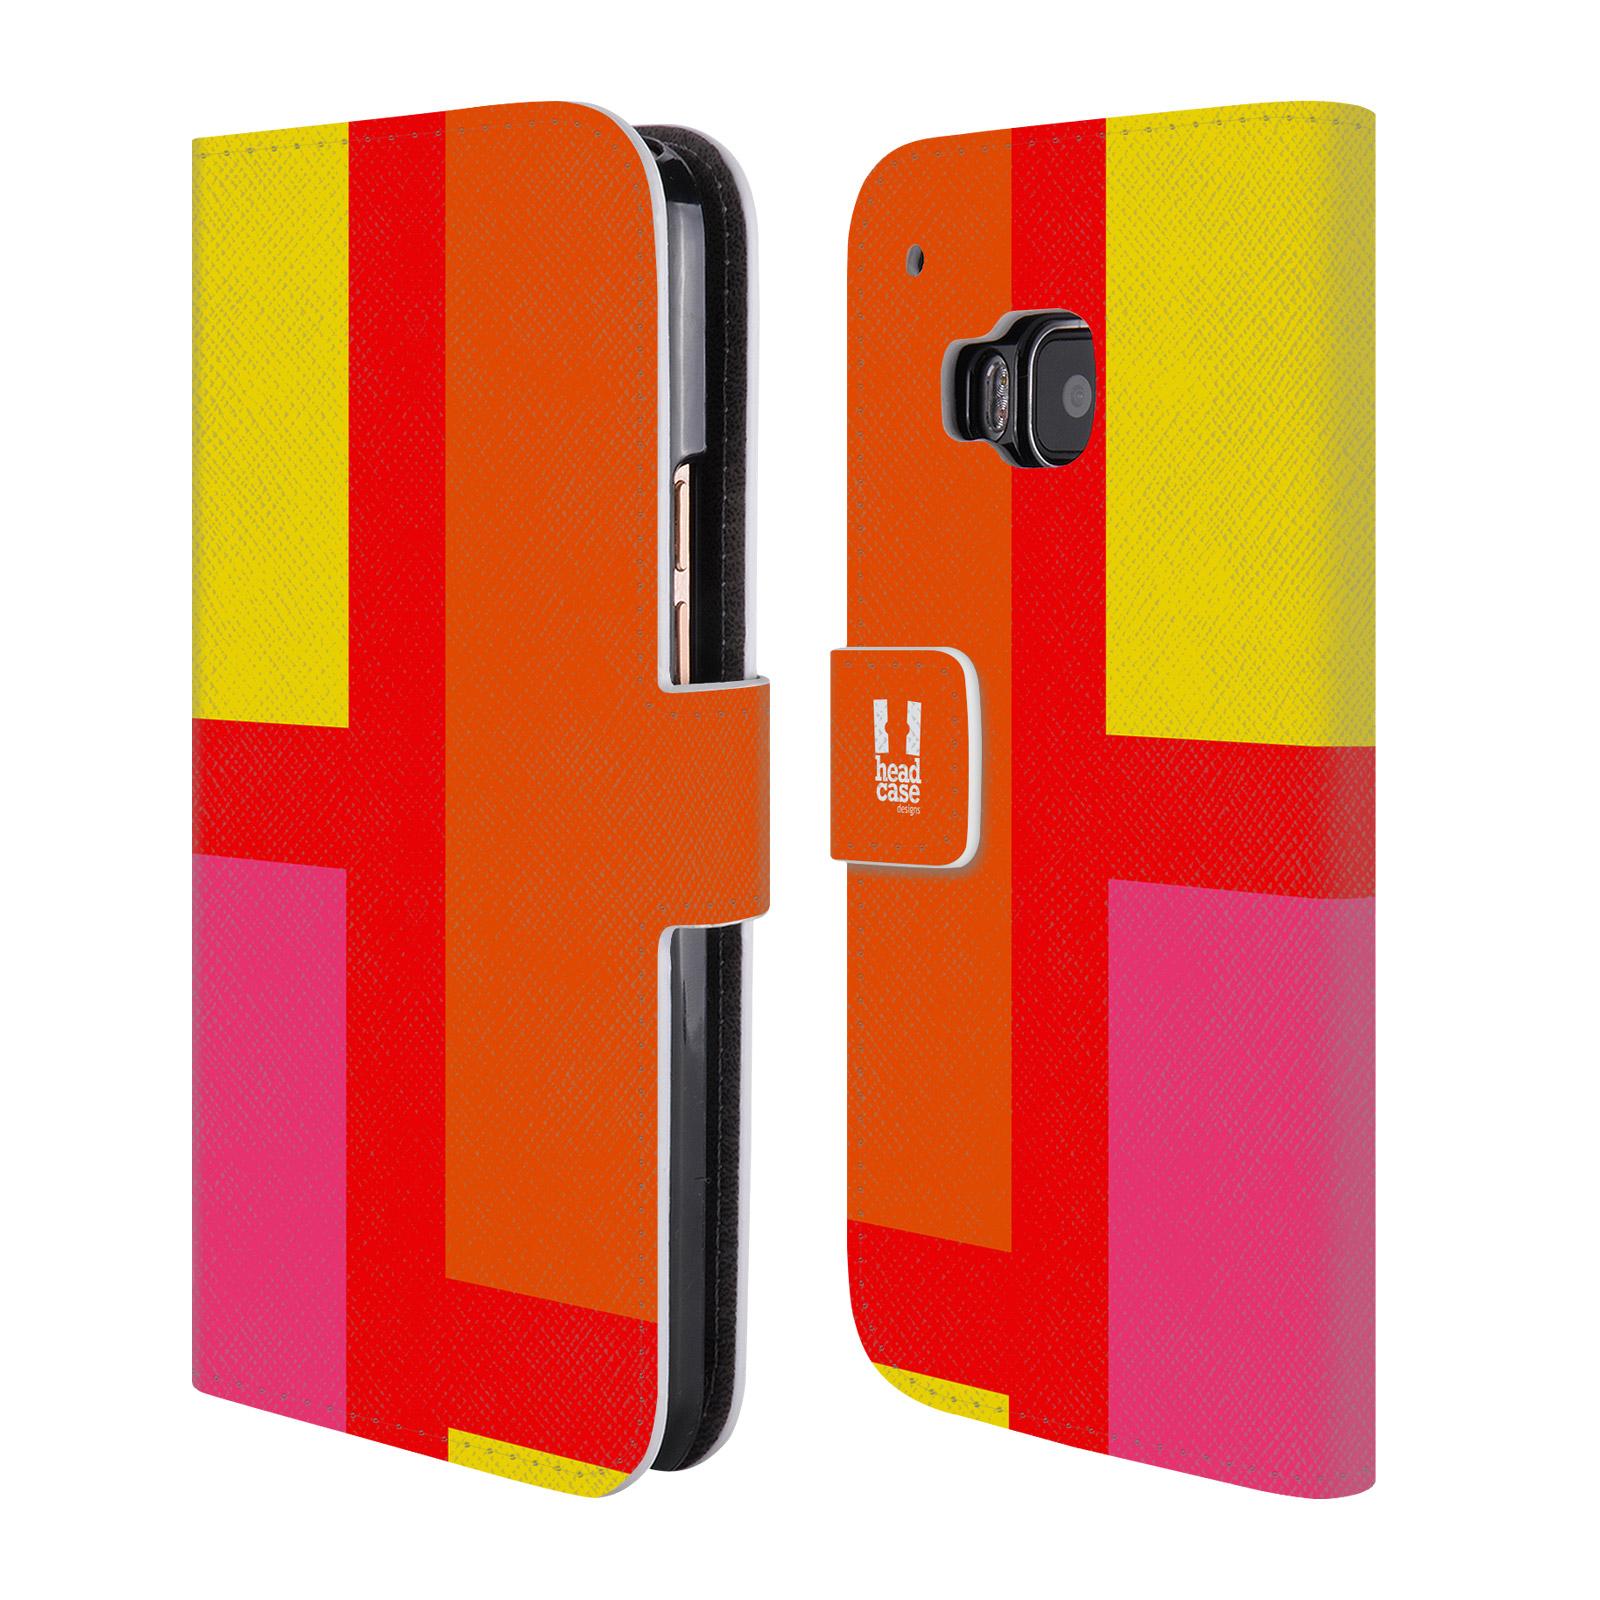 HEAD CASE Flipové pouzdro pro mobil HTC ONE M9 barevné tvary oranžová ulice